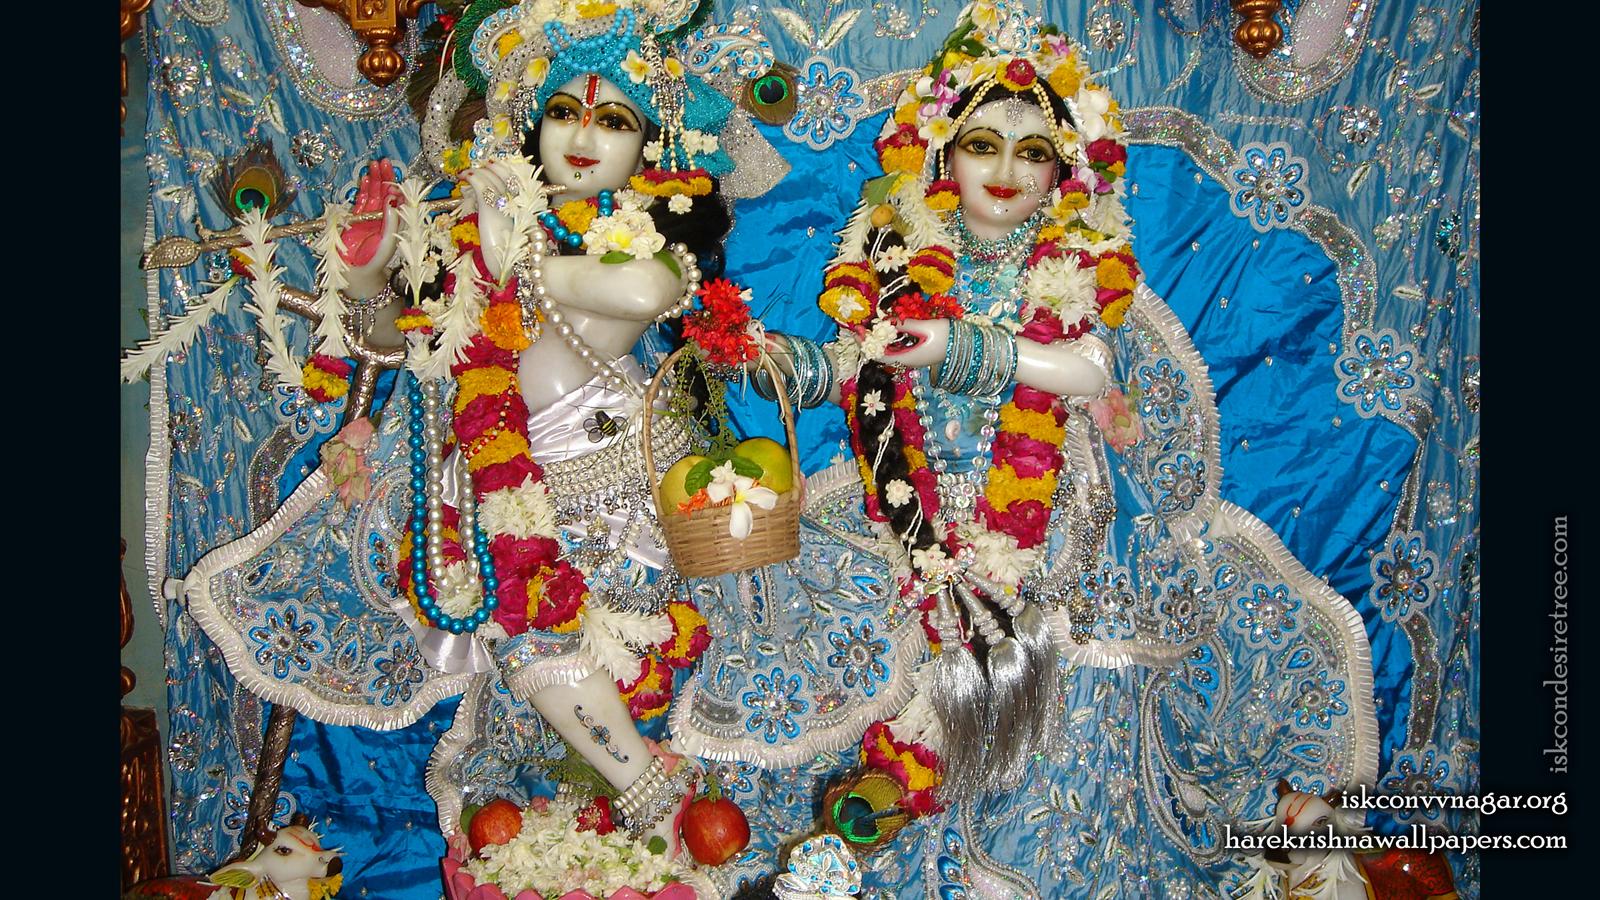 Sri Sri Radha Giridhari Wallpaper (022) Size 1600x900 Download